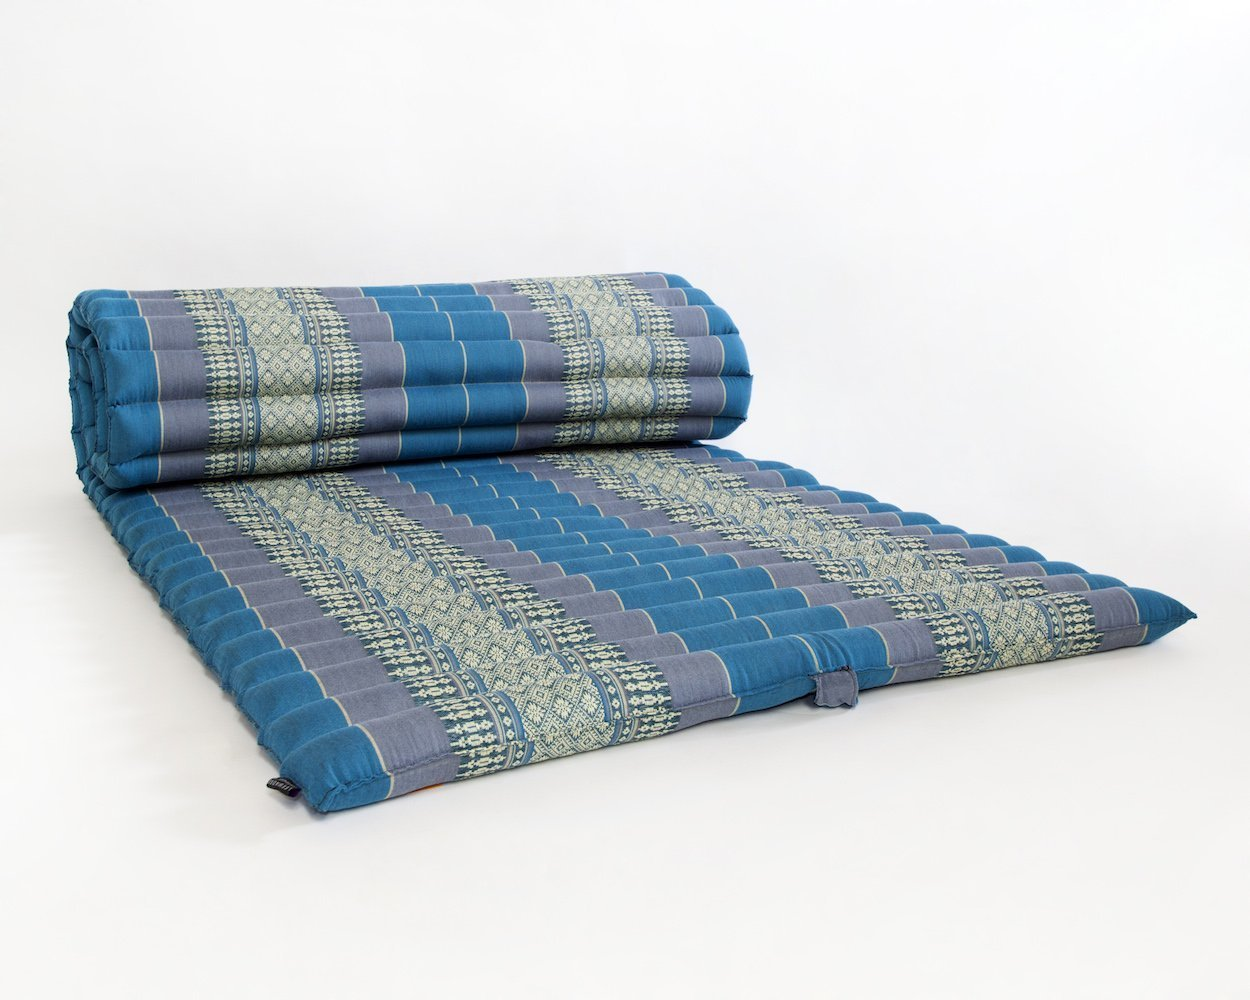 Noinoi@roll up Thai Mattress Kapok (Large, Sky Blue) by thai mattress